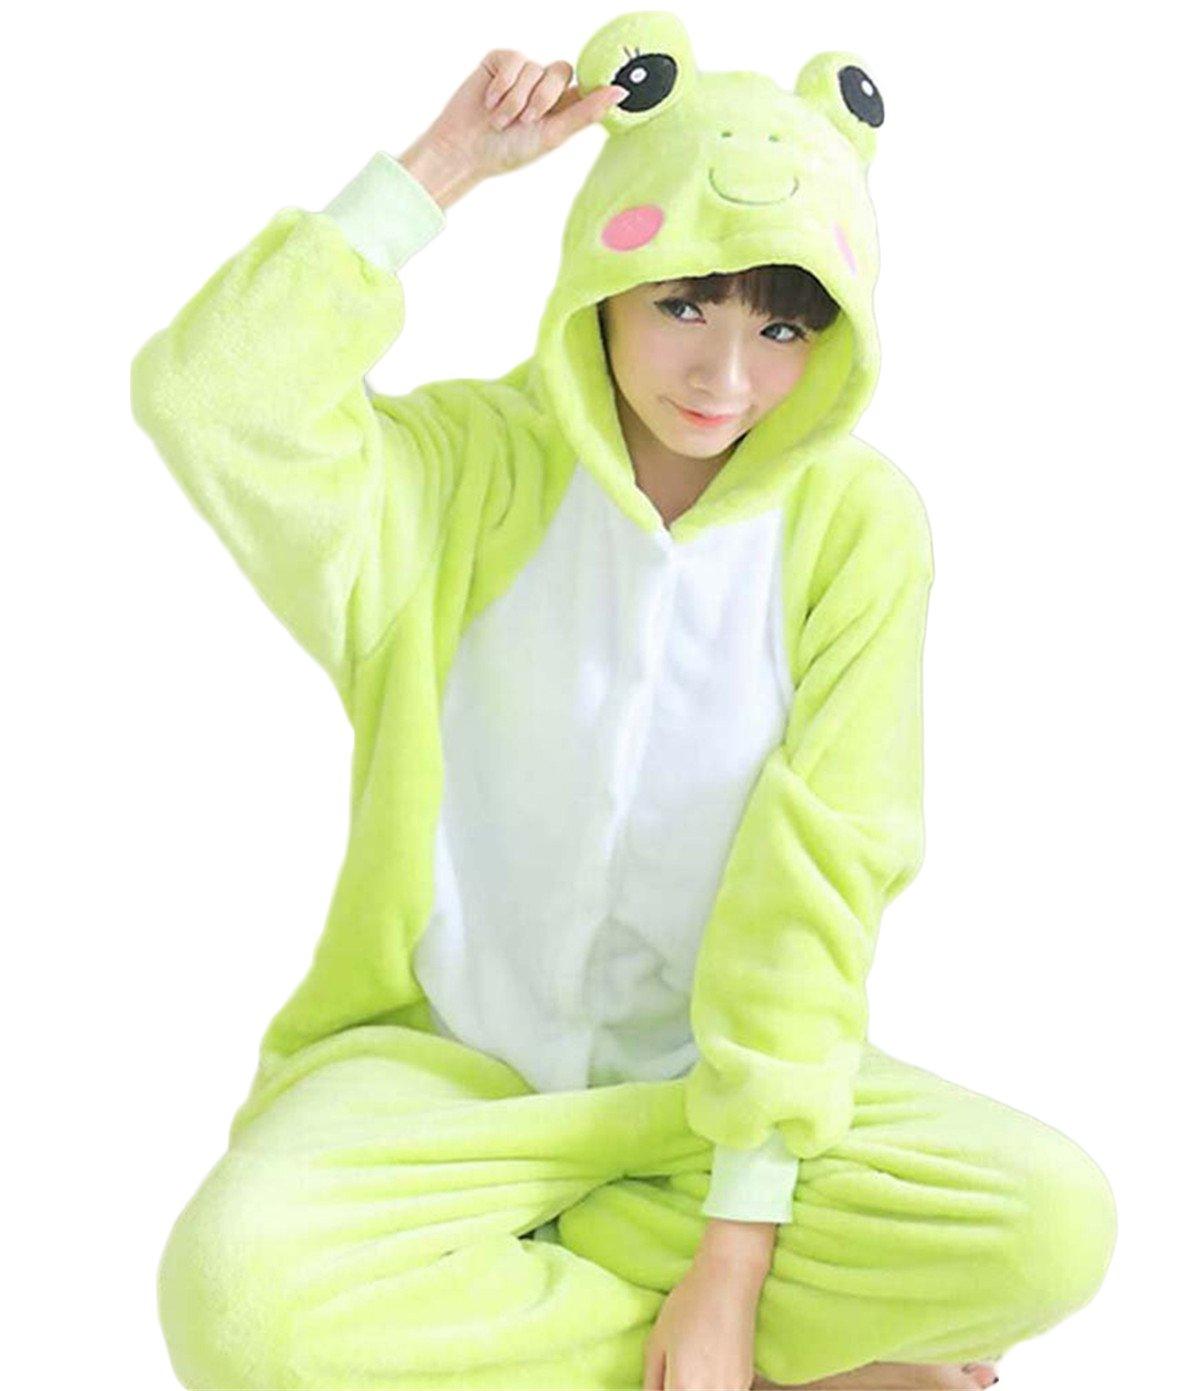 Unisex Kigurumi adulto Animal Cosplay disfraz pijama Onesies Pijamas, Rana, small: Amazon.es: Hogar